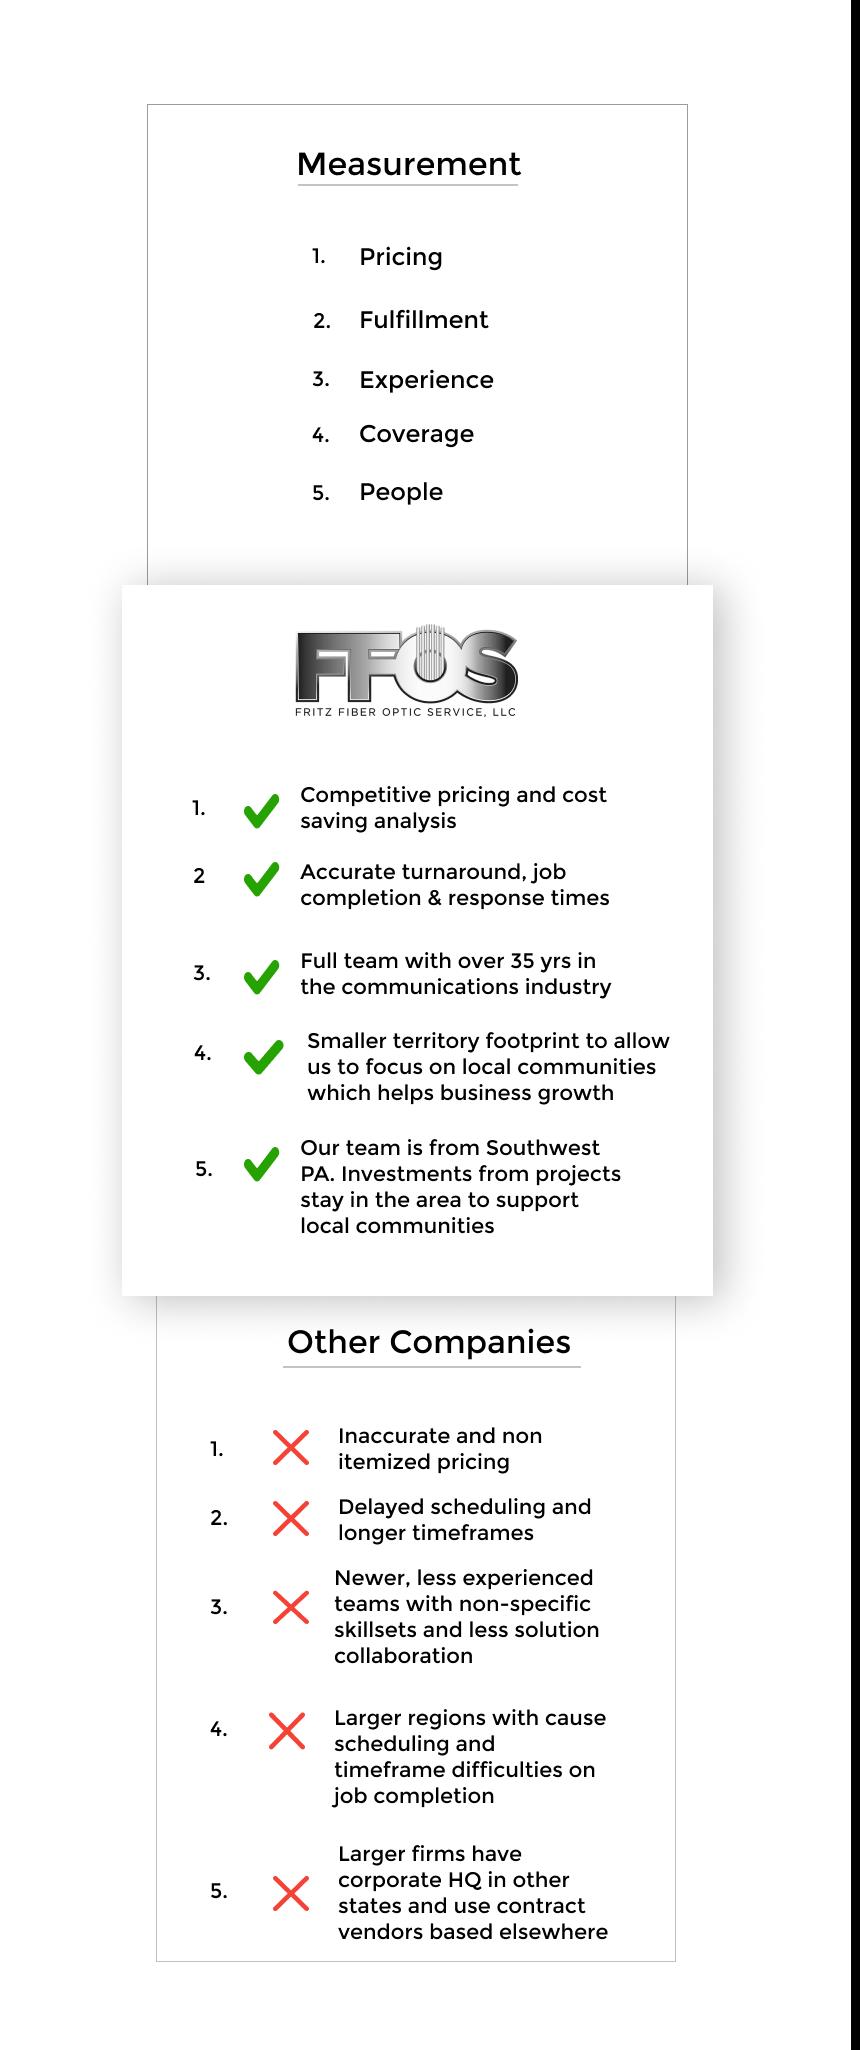 comparison grid of Fritz Fiber Optic versus other companies